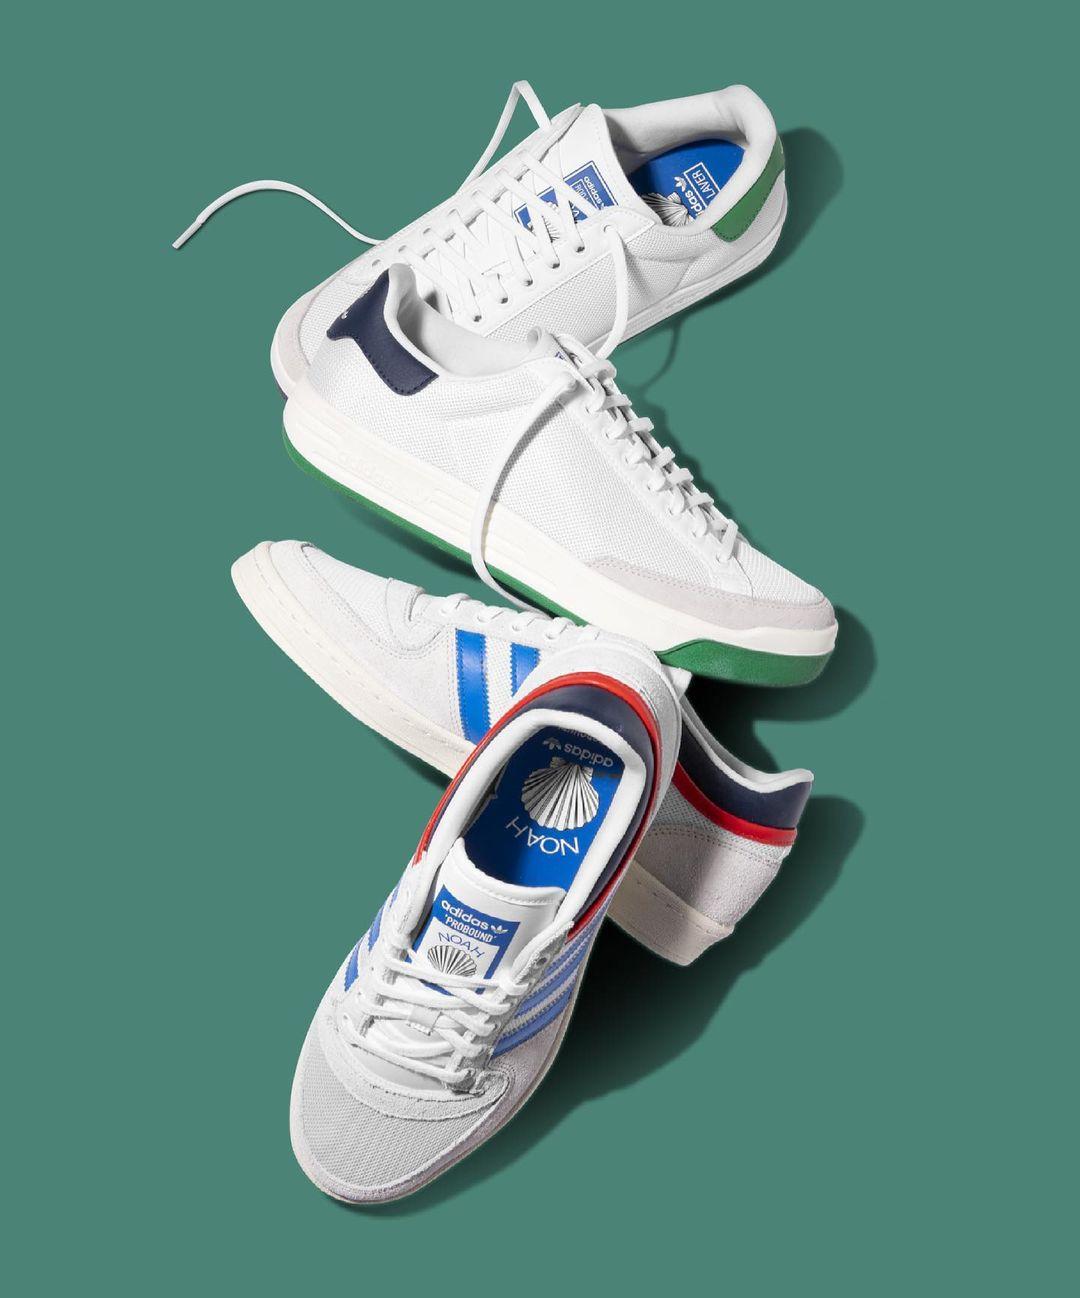 NOAH,adidas  海洋风格 + 花卉元素!全新 NOAH xadidas 联名即将发售!